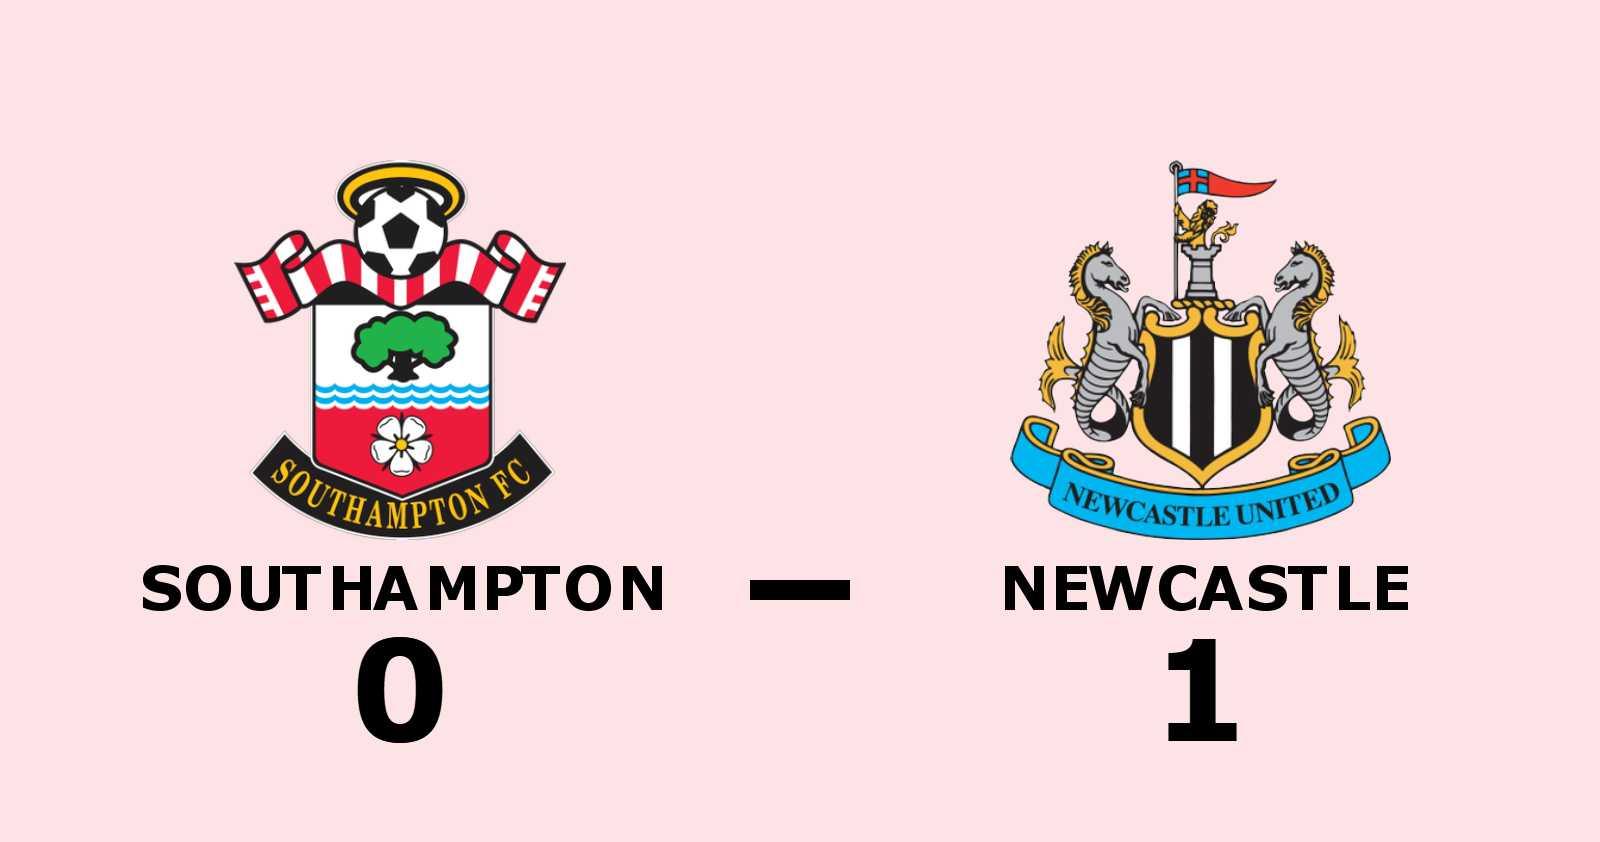 1-0-seger för Newcastle mot Southampton - Allan Saint-Maximin matchhjälte